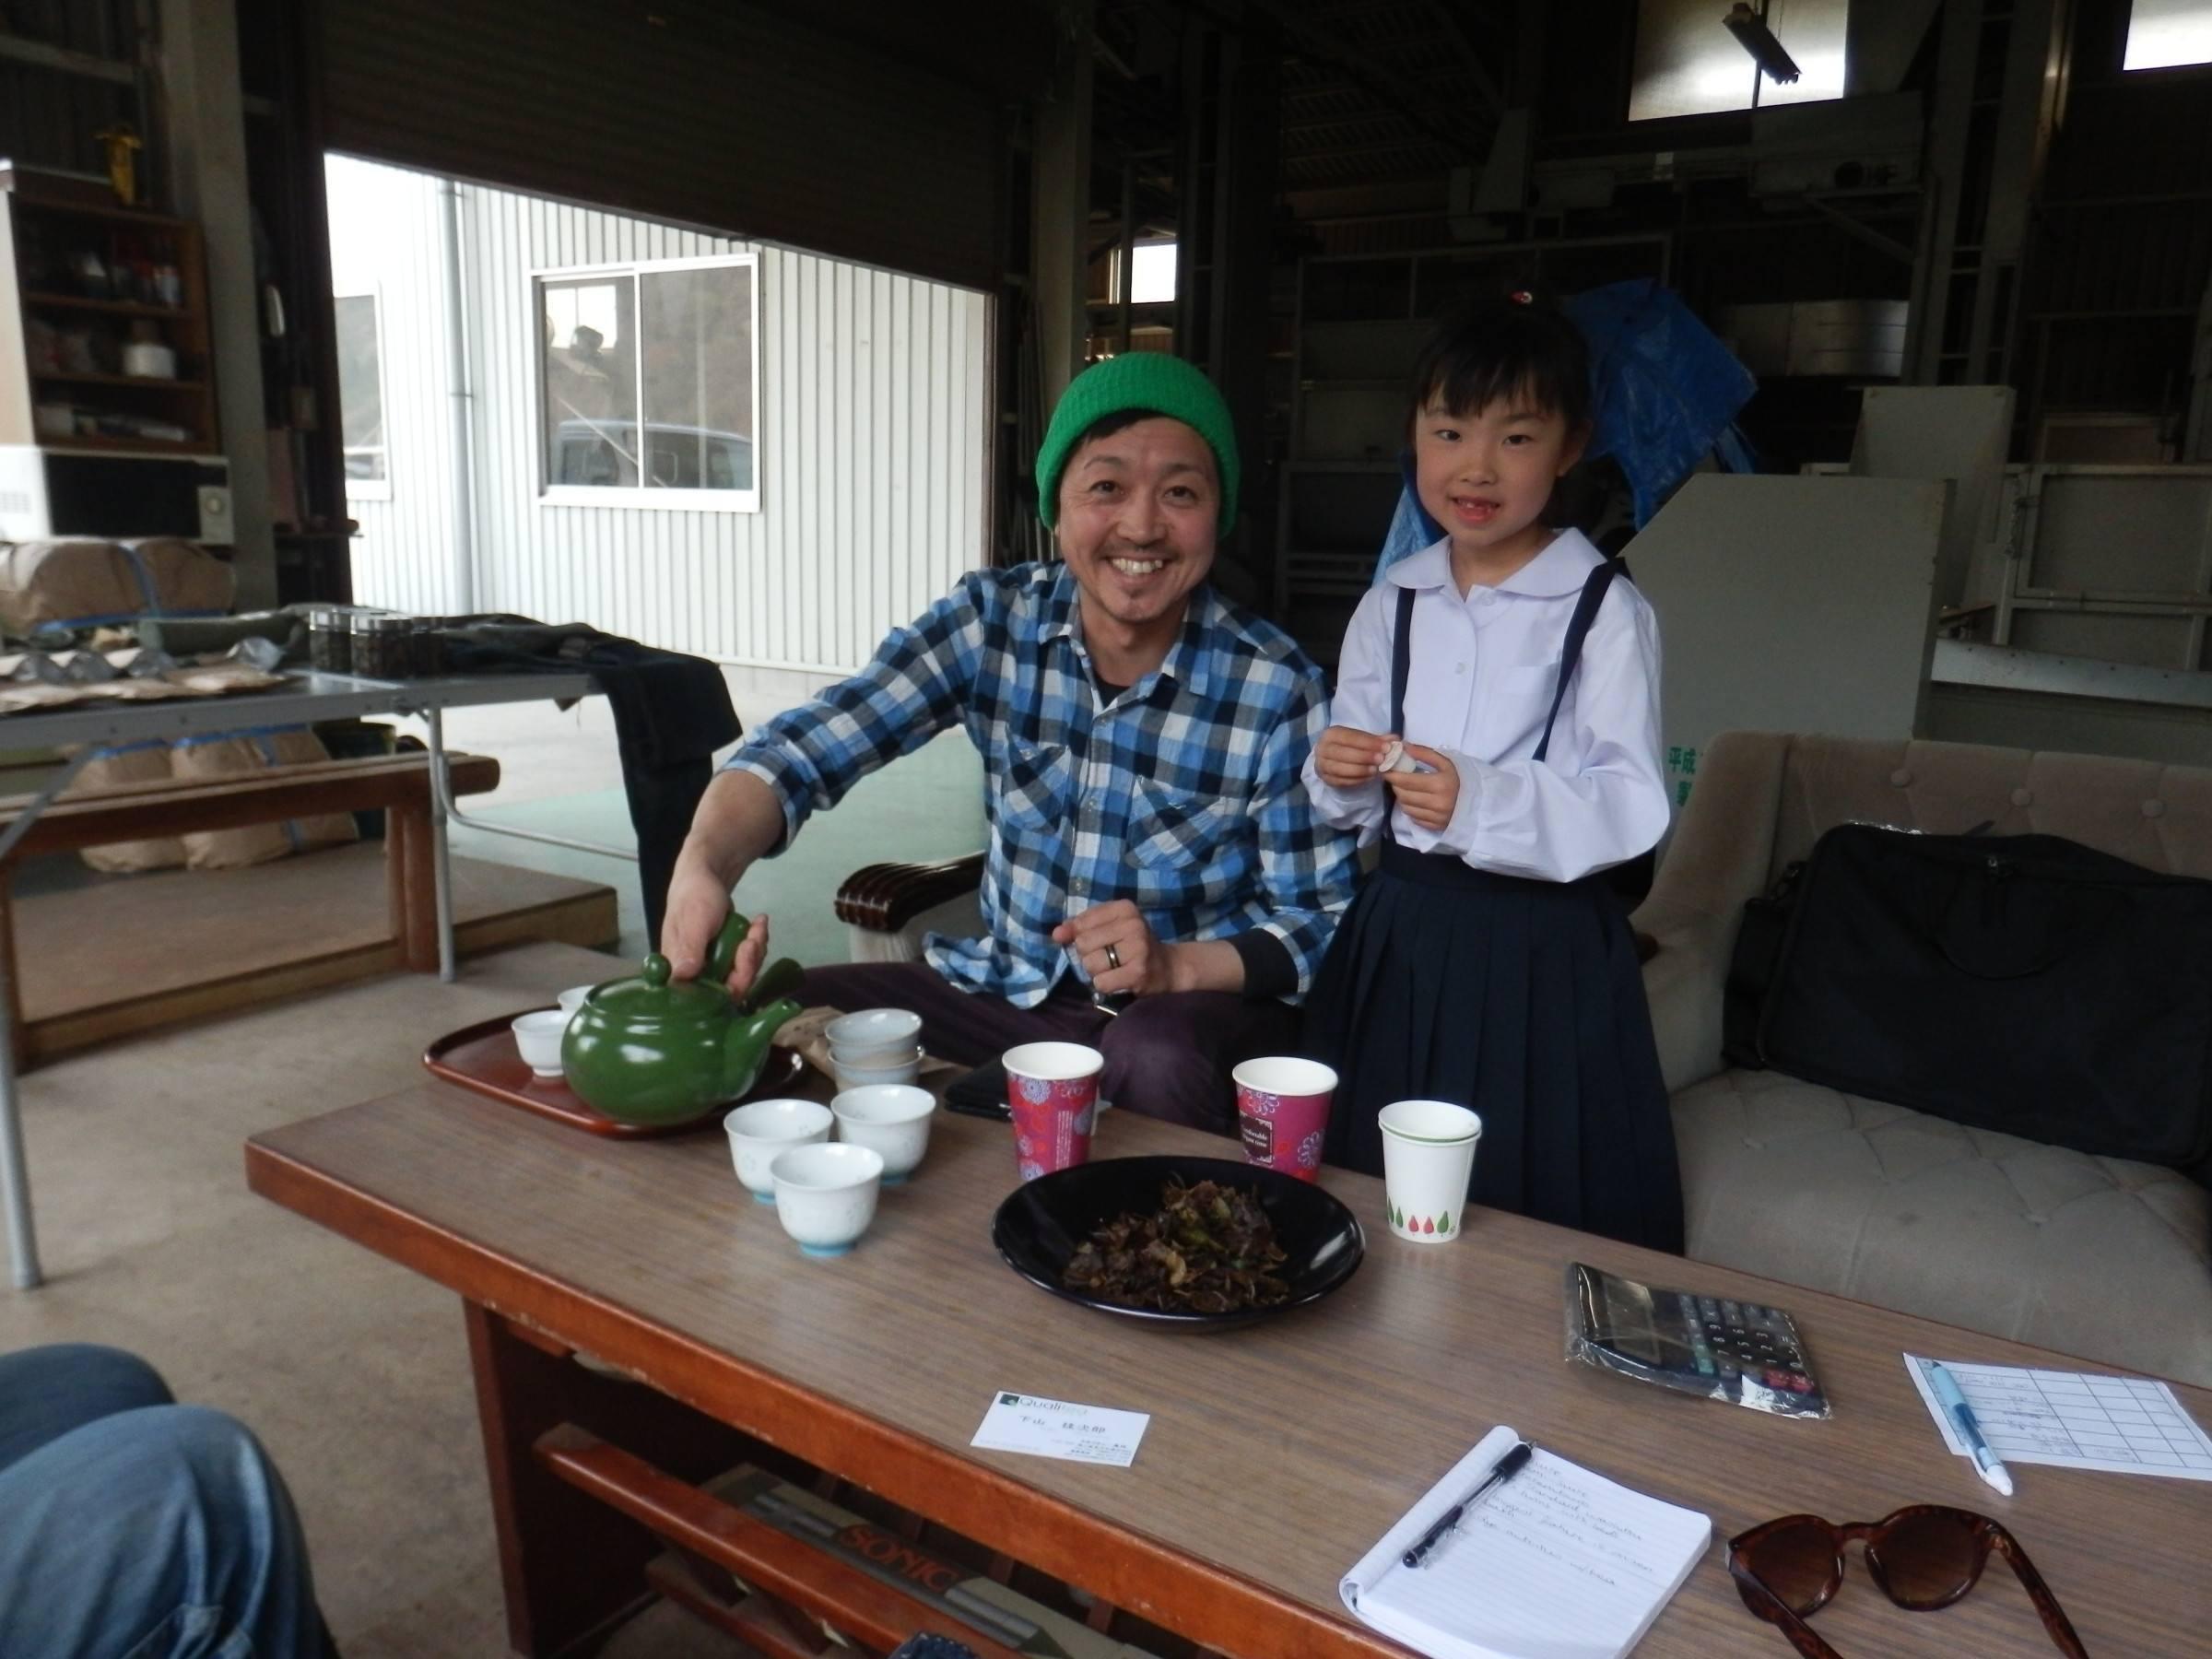 Having tea with Mr Shimoyama and his daughter